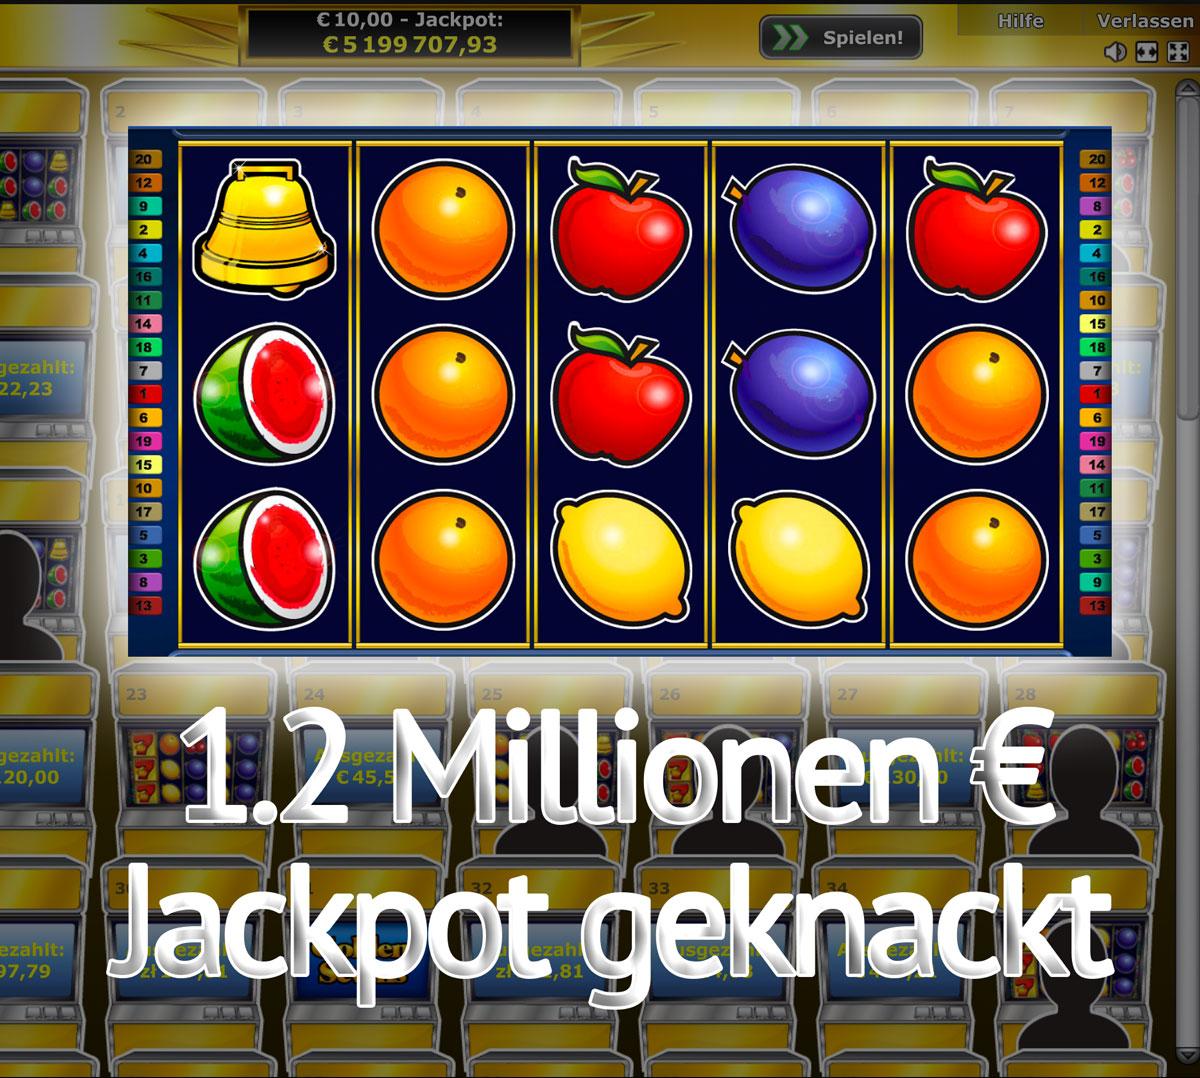 novoline jackpot 2 euro pro dreh